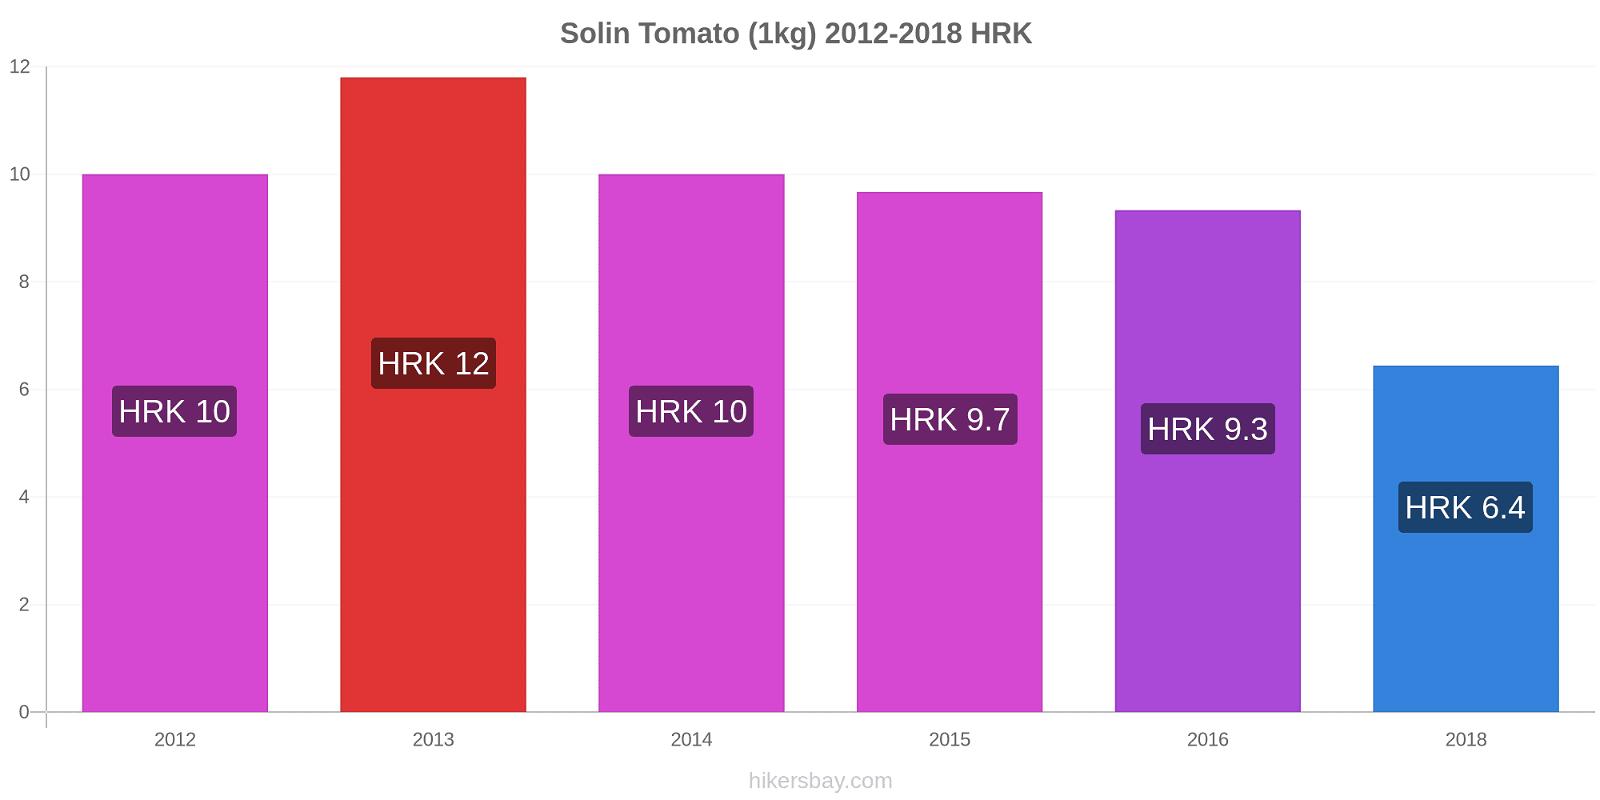 Solin price changes Tomato (1kg) hikersbay.com